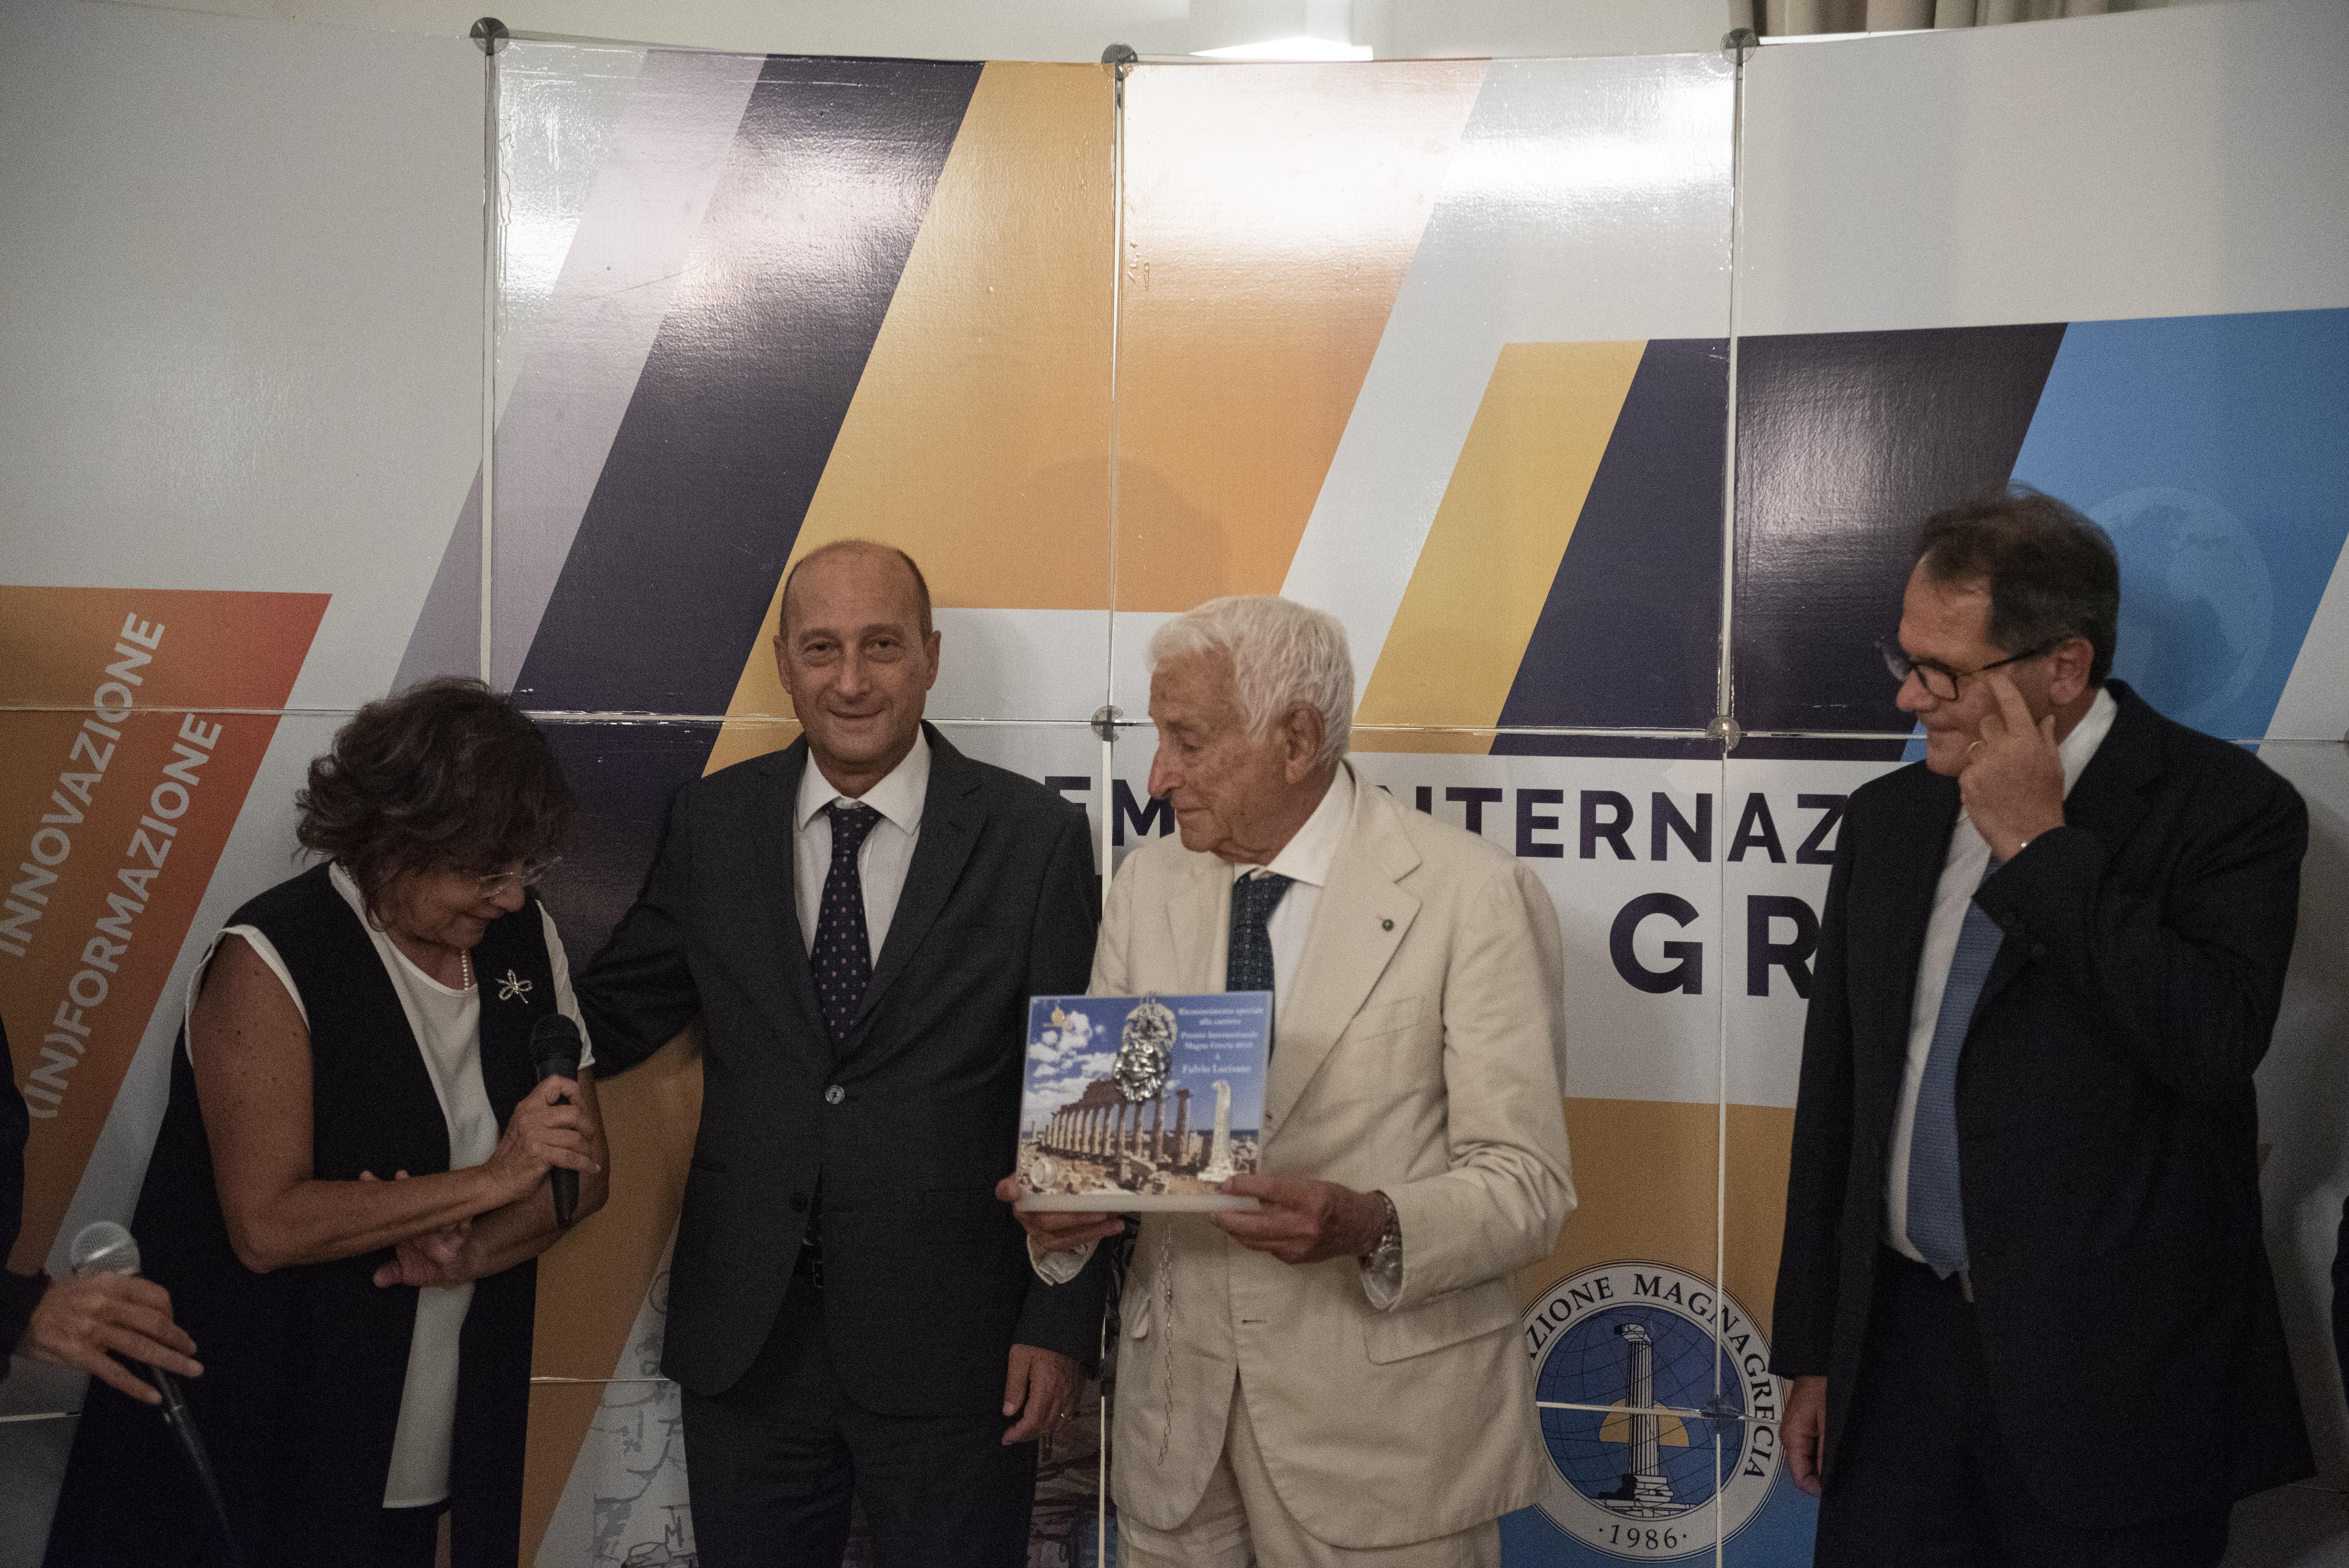 Premio-MG-2019-_-23